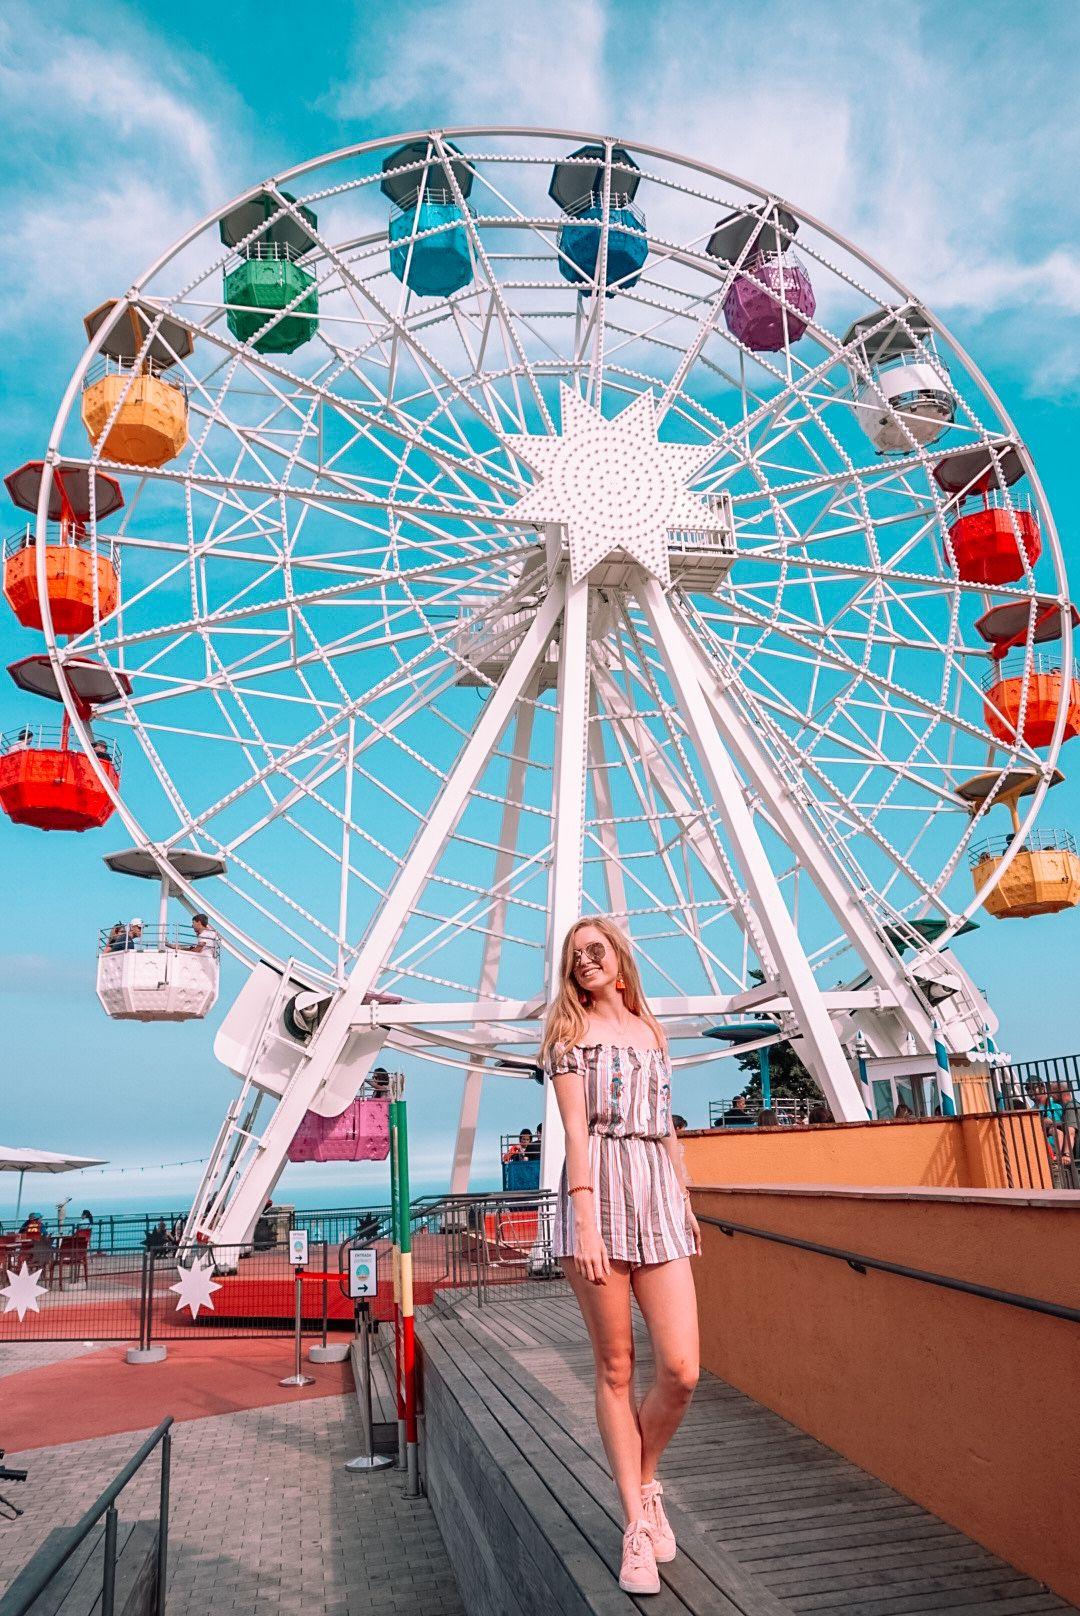 Parc D Atraccions Tibidabo Barcelona Spain Tibidabo Barcelona Amusement Park Photoshoot Aesthetic Amusement Park